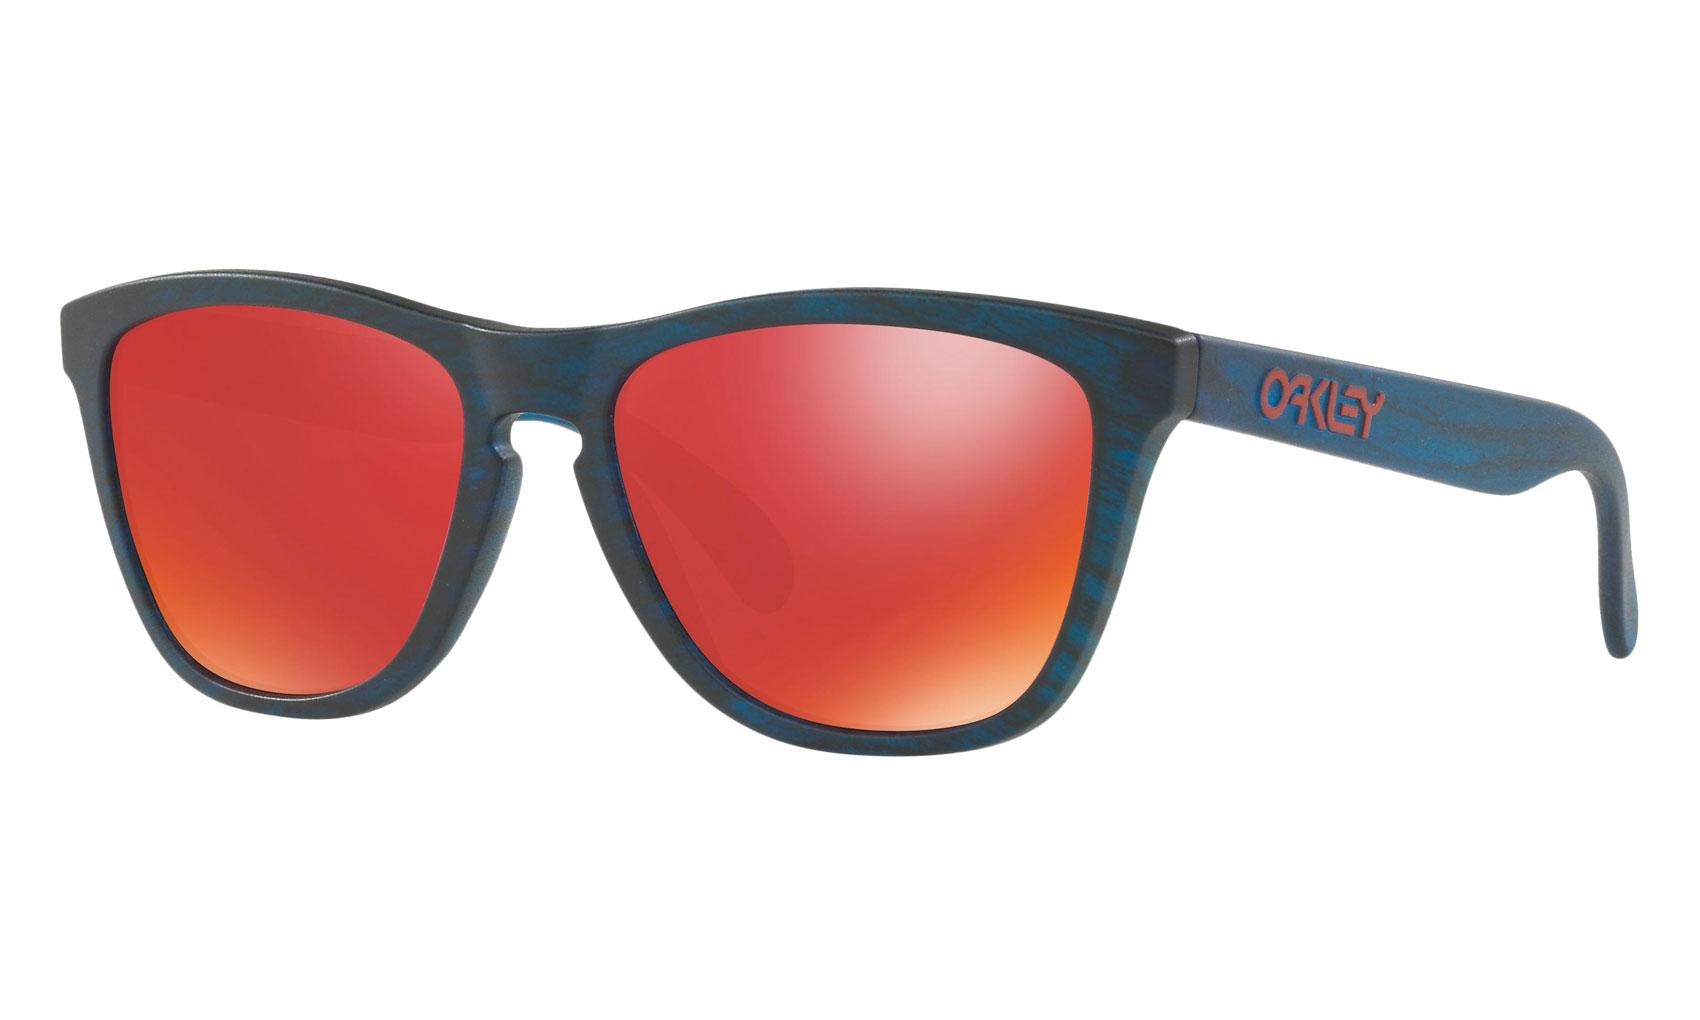 99b24c94c14 Oakley Frogskins Sunglasses Matte Blue Woodgrain Torch Iridium ...